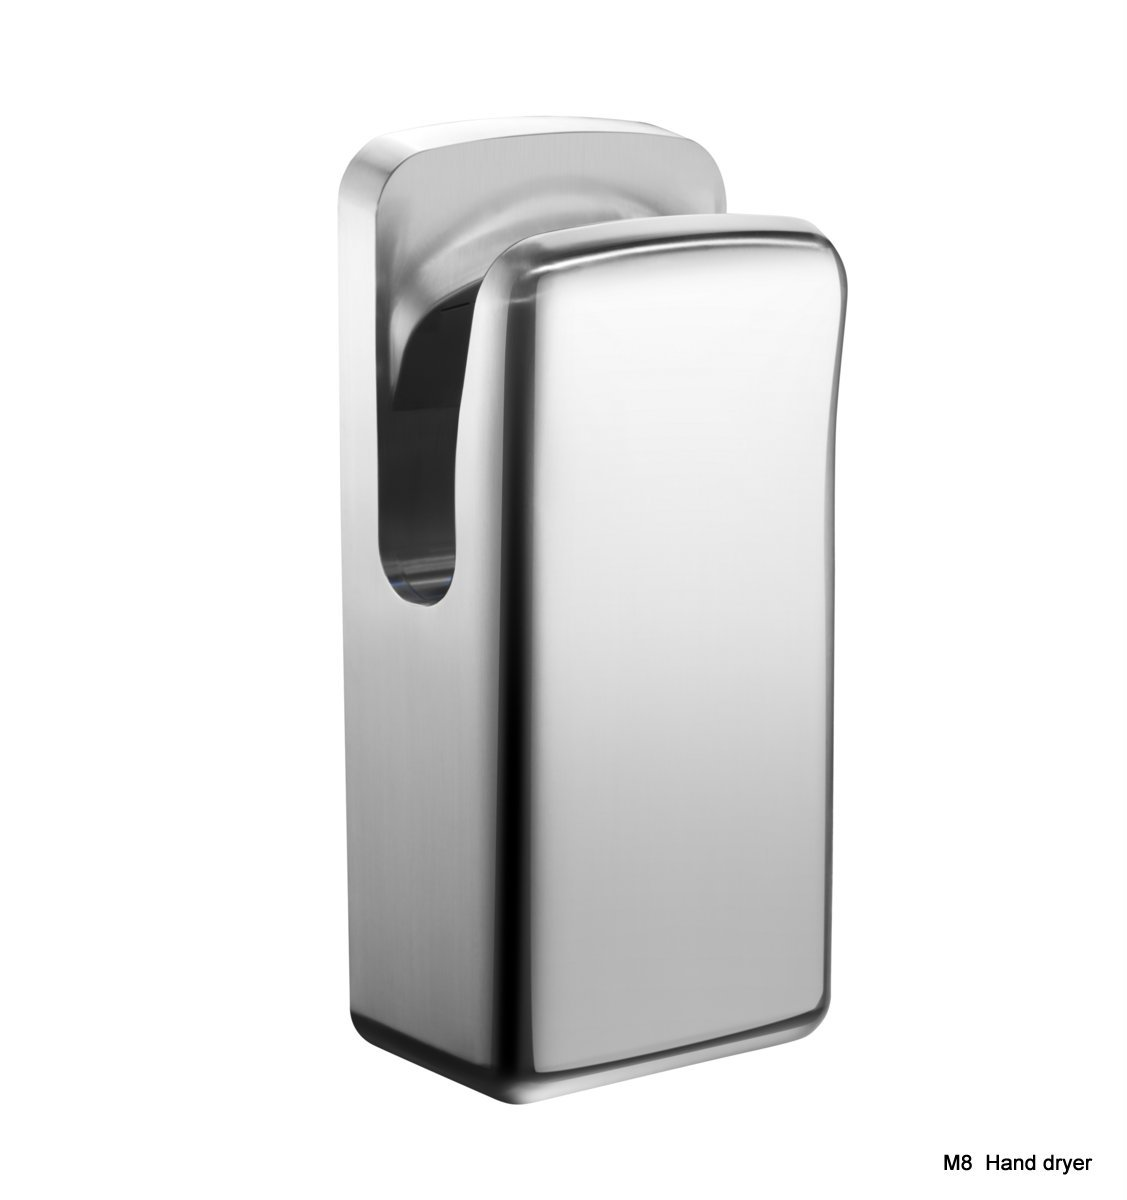 M8 Hand dryer